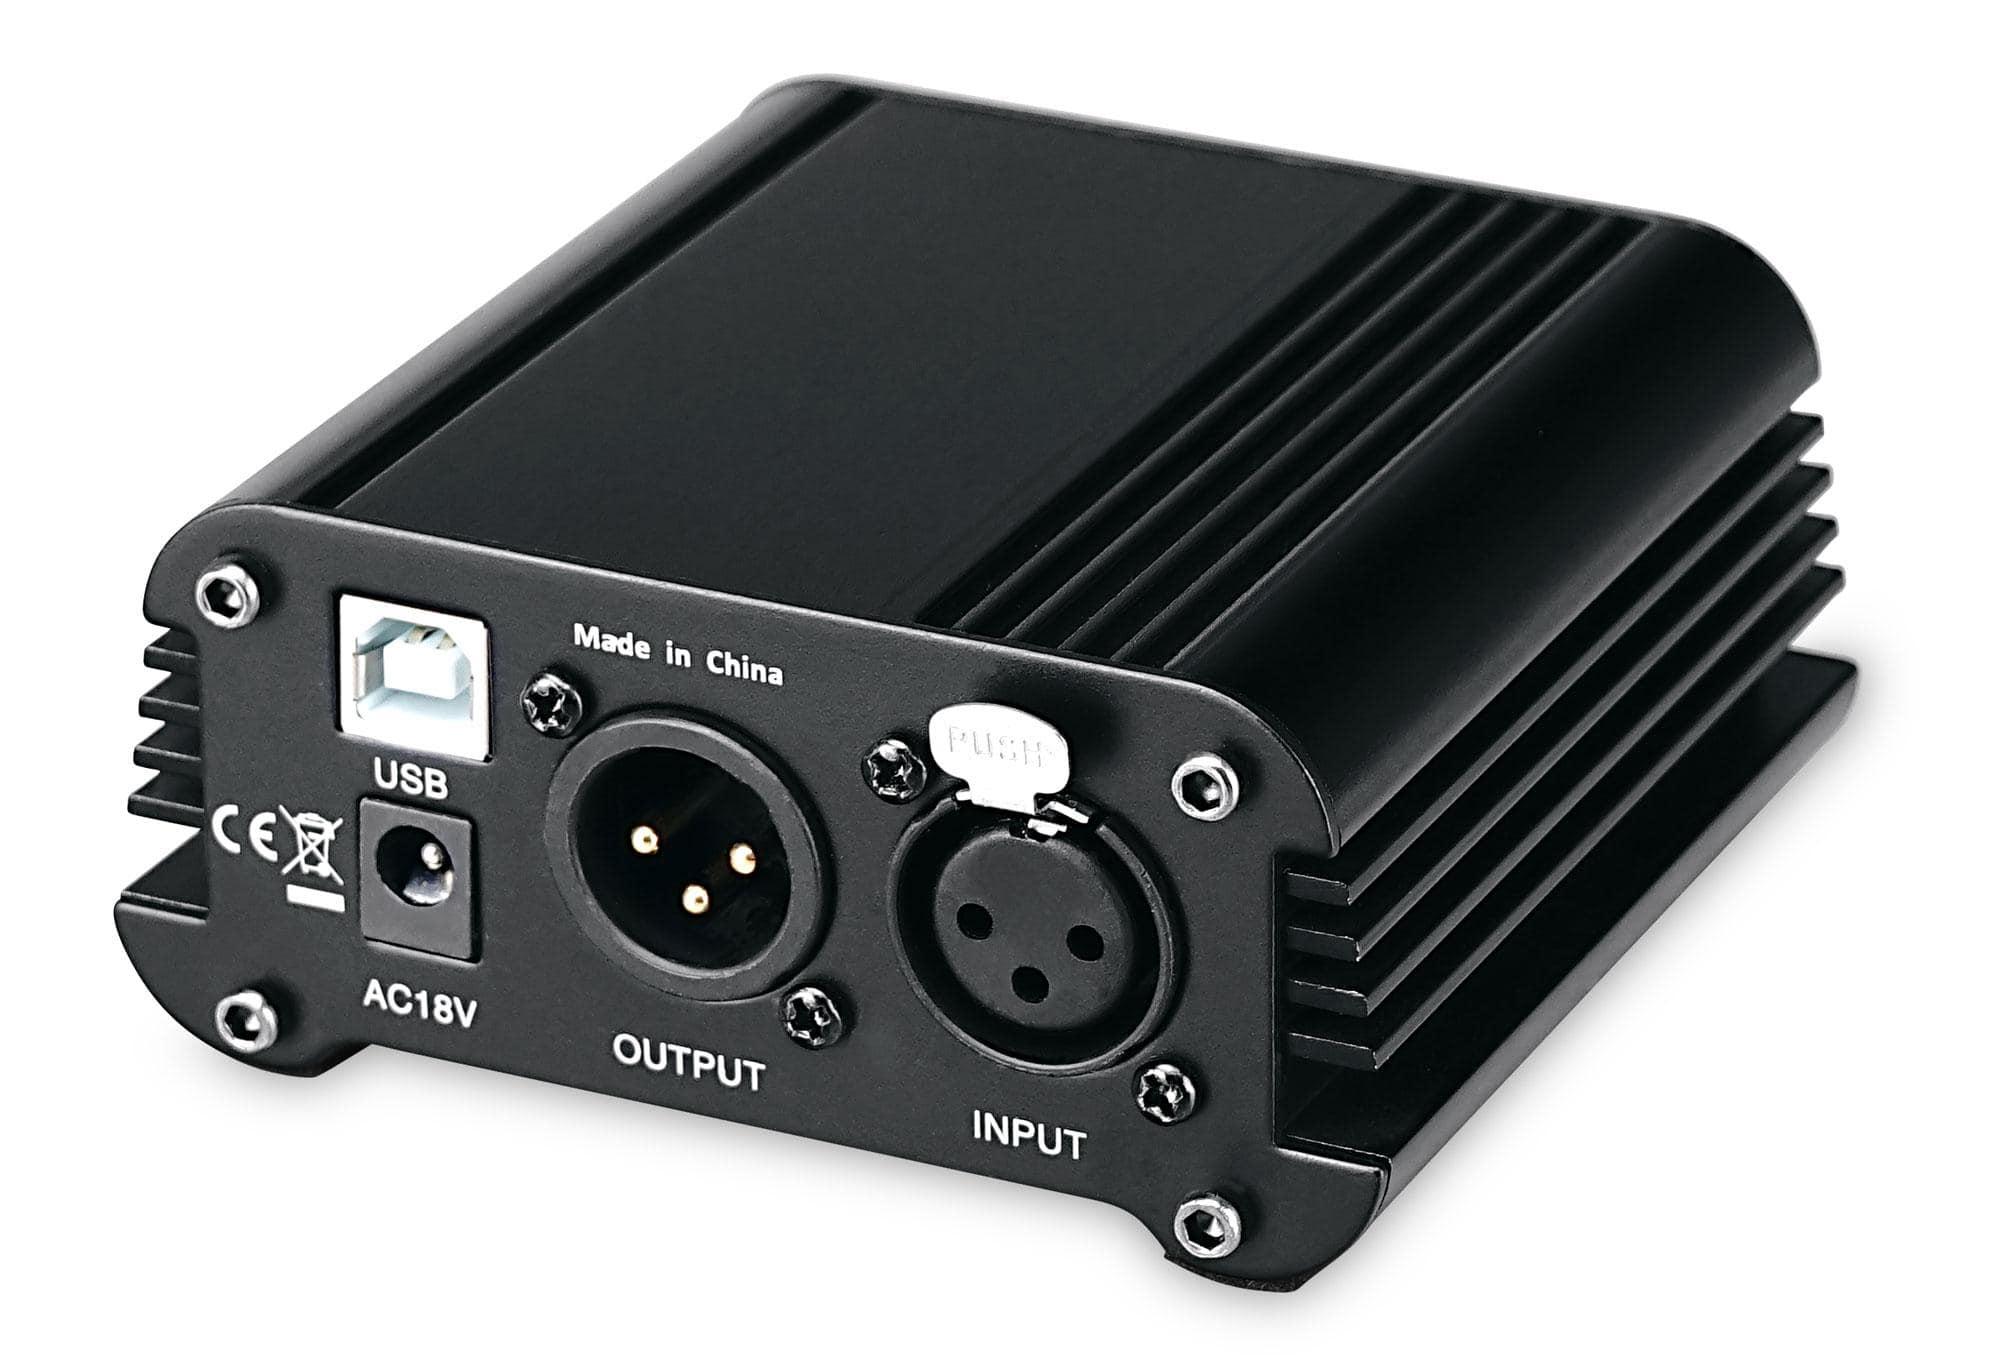 Pronomic PP 10 USB Phantomspeisung mit Audiointerface Retoure (Zustand sehr gut)